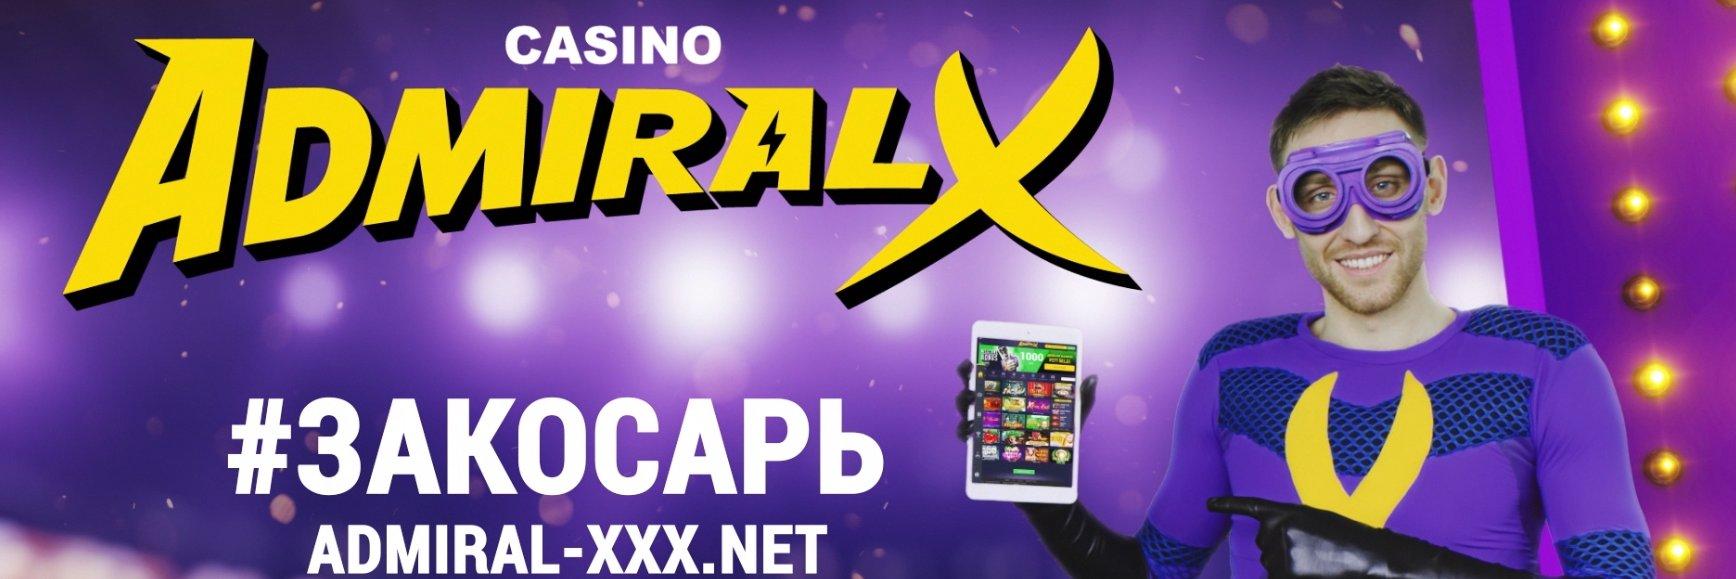 казино admiral xxx net